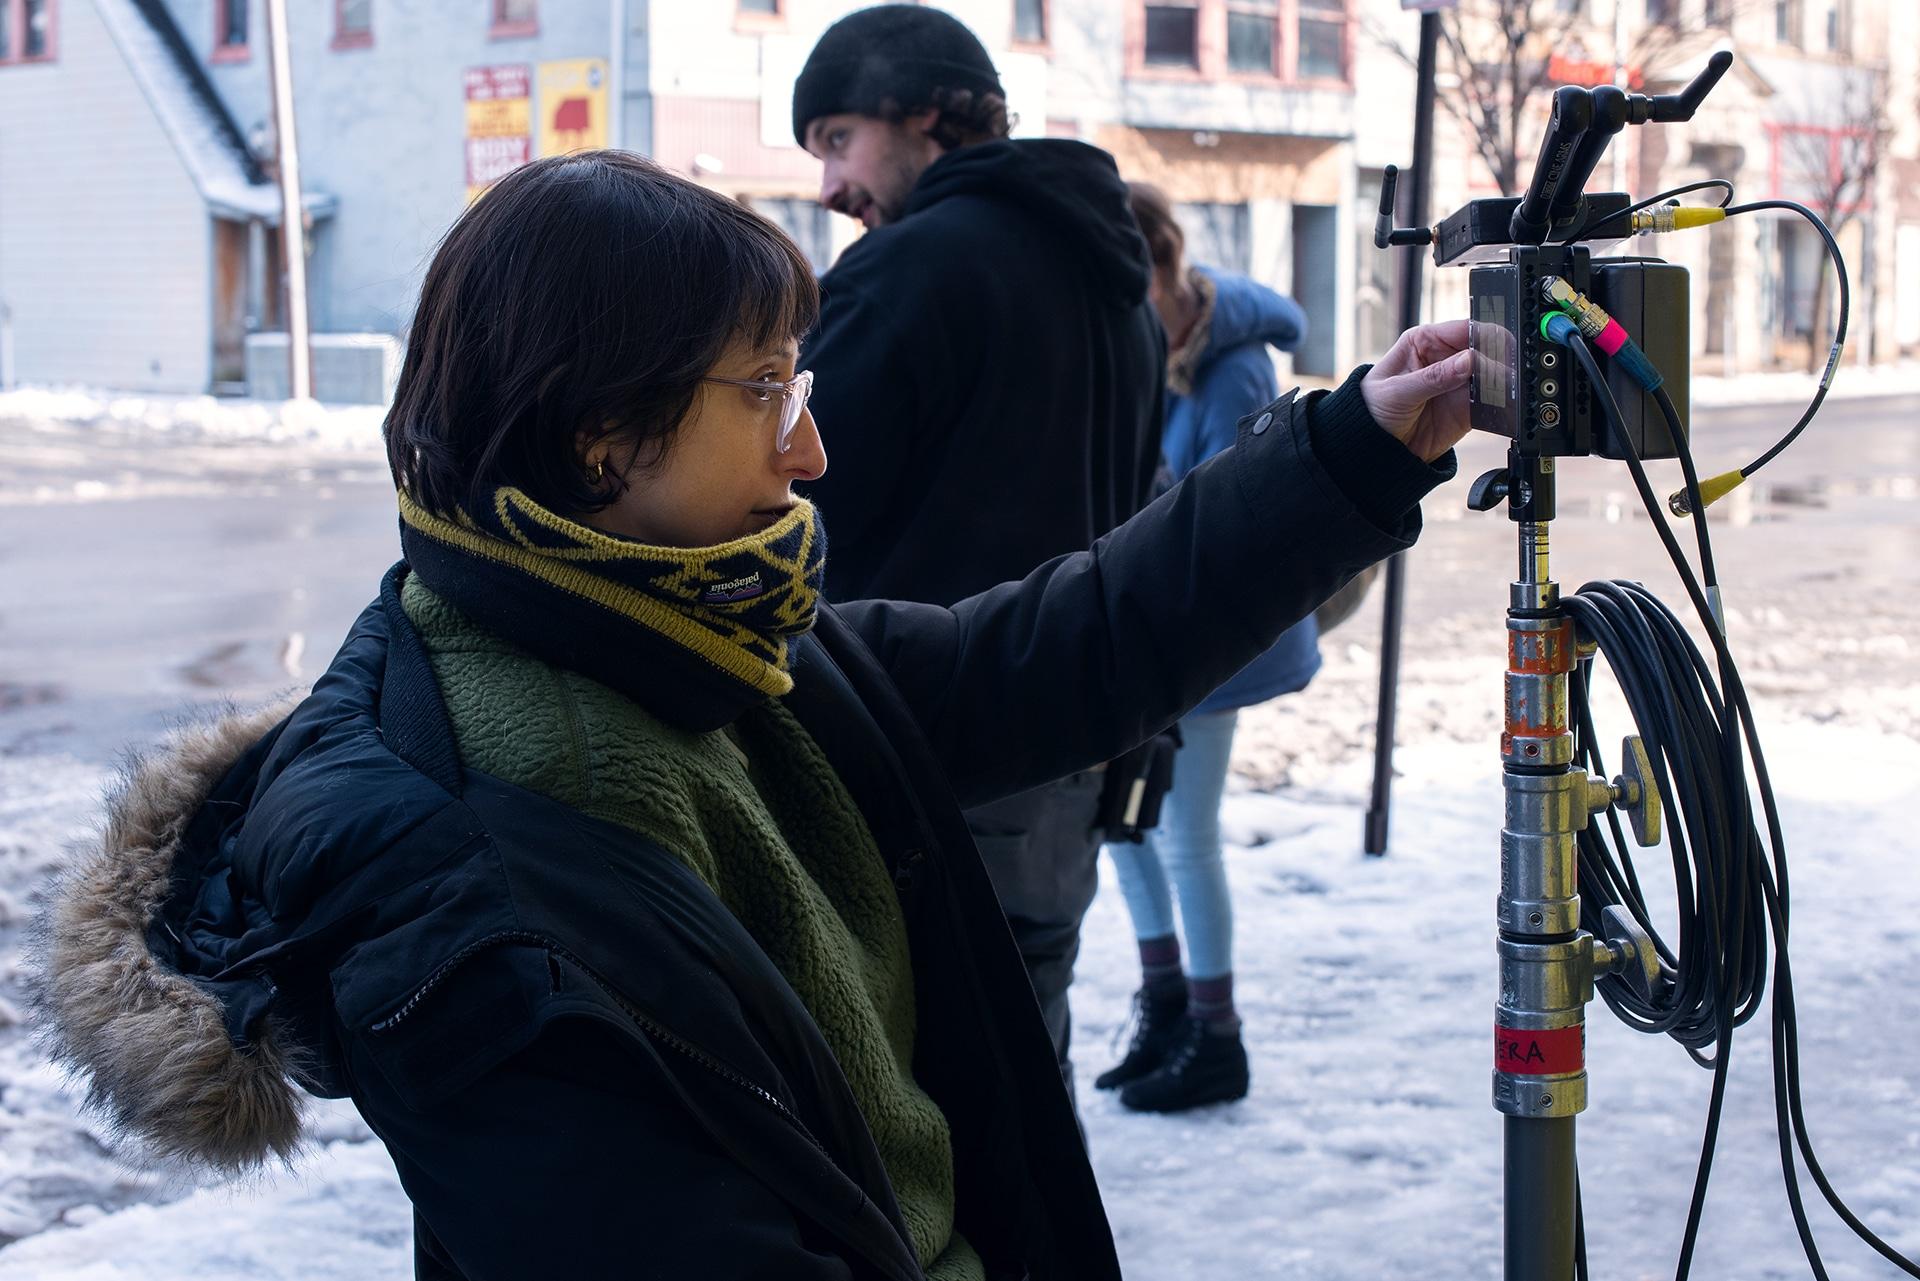 Director Eliza Hittman (Film/Video MFA 10) on the set of her film Never Rarely Sometimes Always.